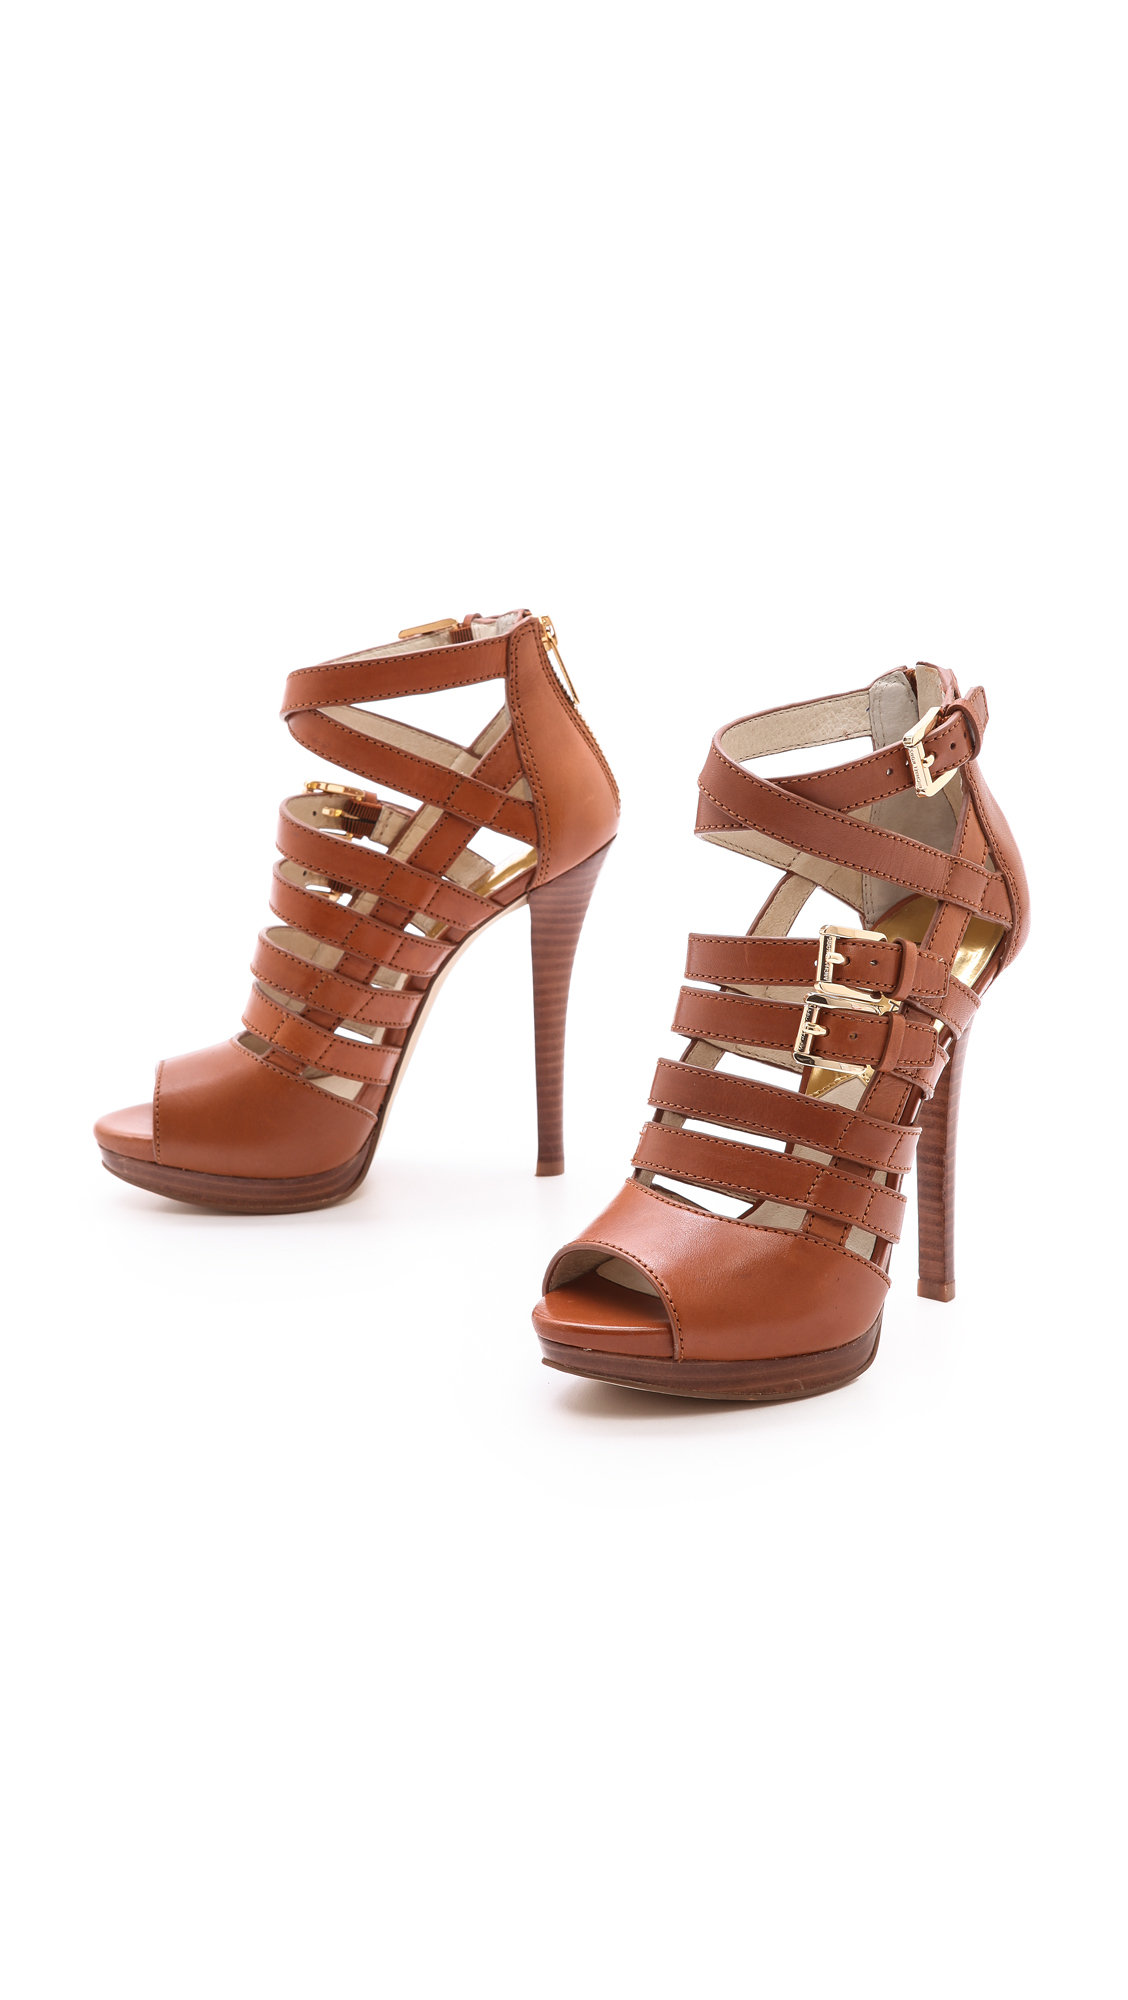 MICHAEL 93QOgWT3Wx SANDRA PLATFORM - High heeled sandals - black WIhh33C